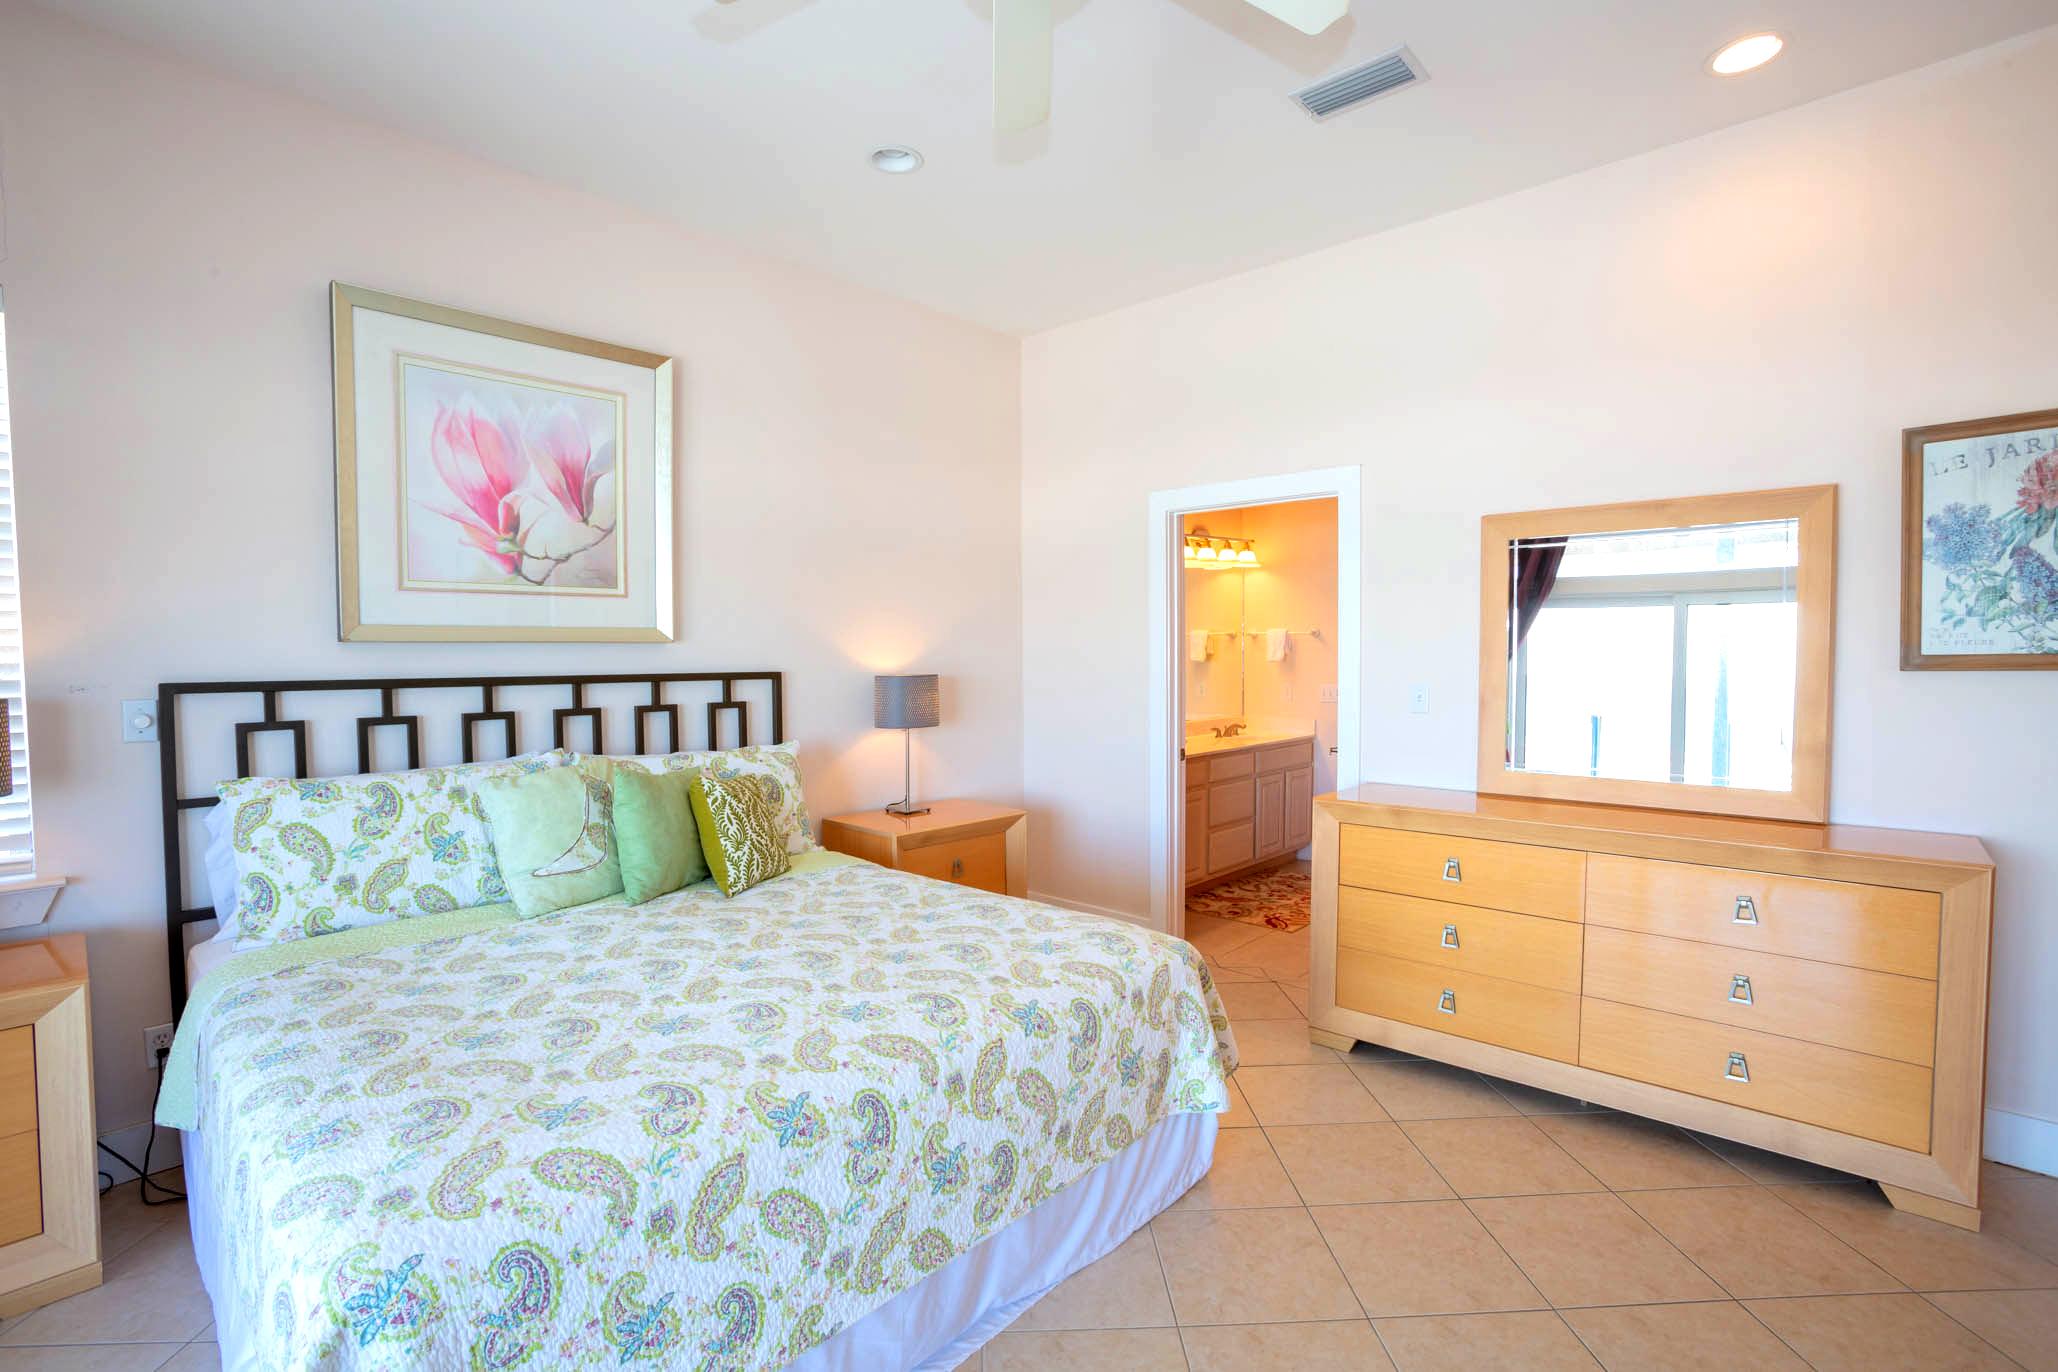 Ariola 1214 House/Cottage rental in Luxury Homes in Pensacola Beach Florida - #28